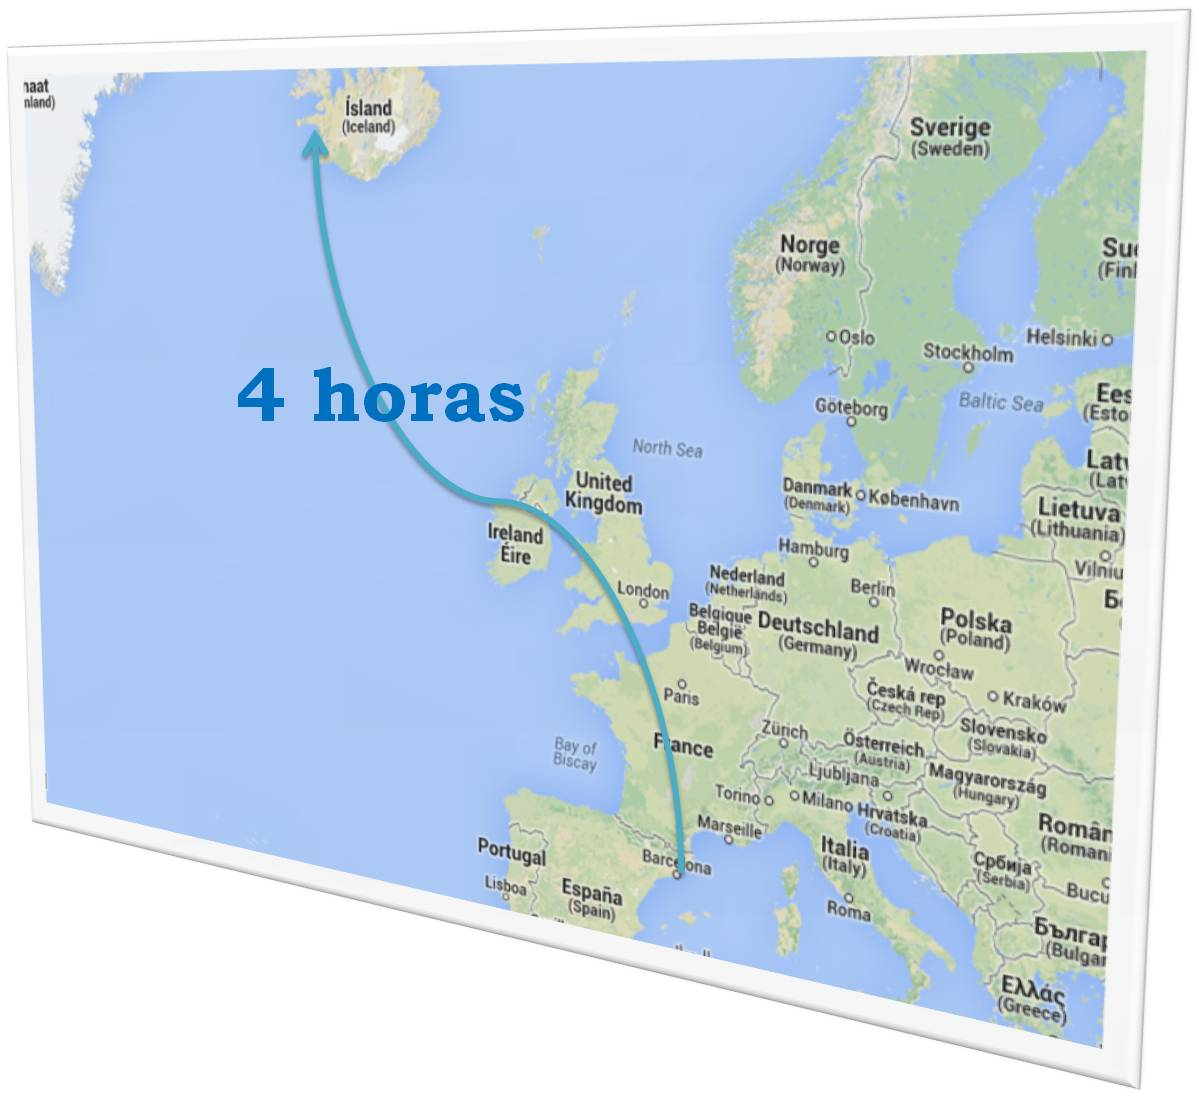 Islandia en el mapa  f6510ba5e5ca